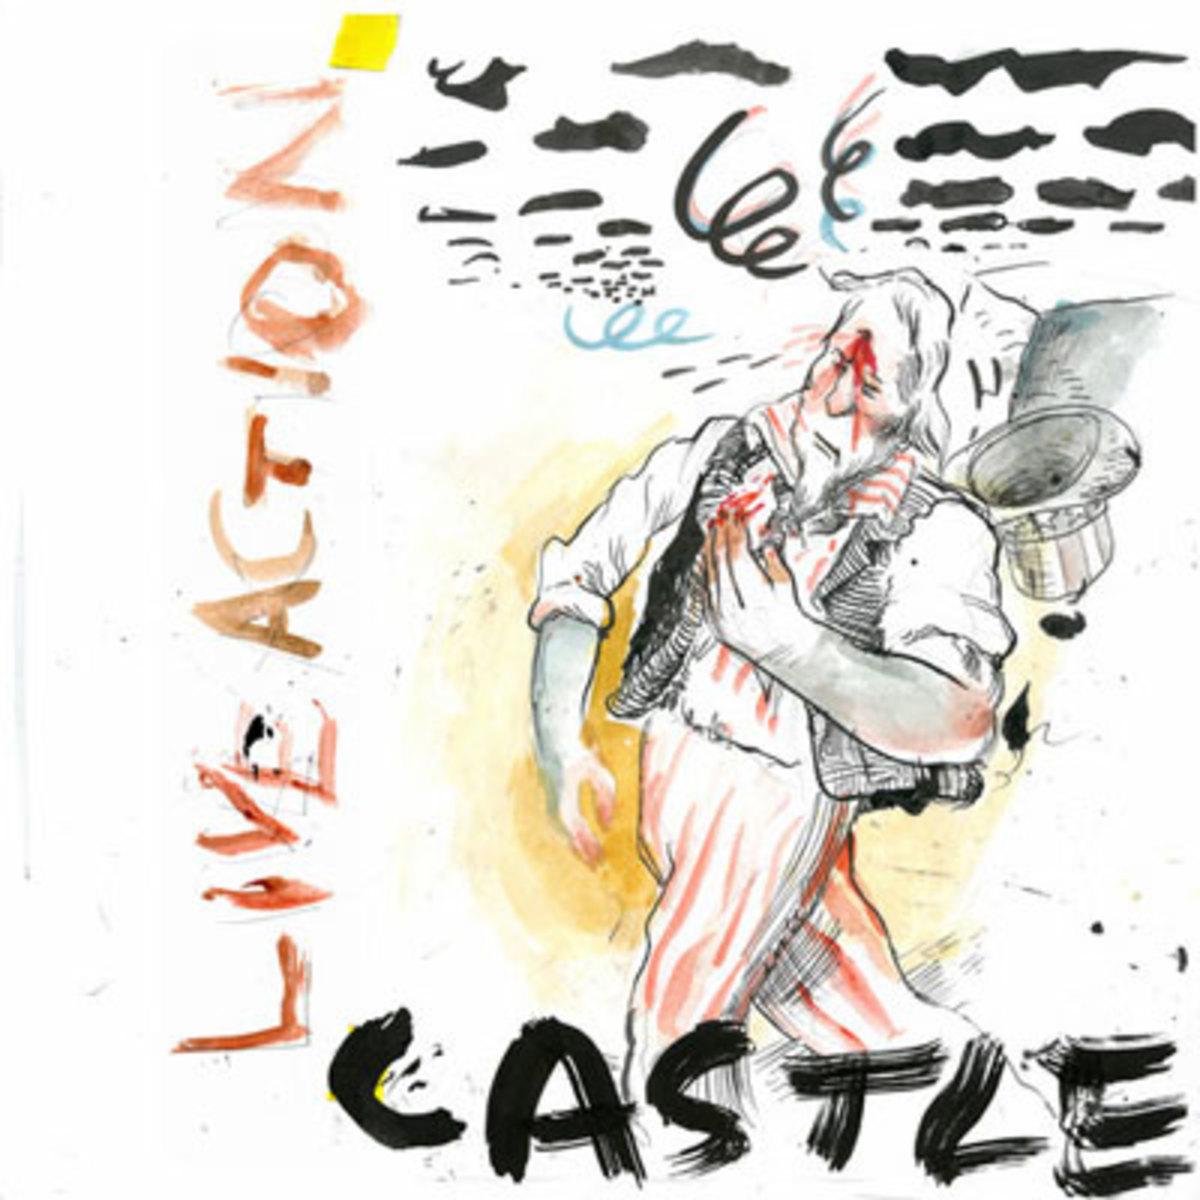 castle-liveaction.jpg